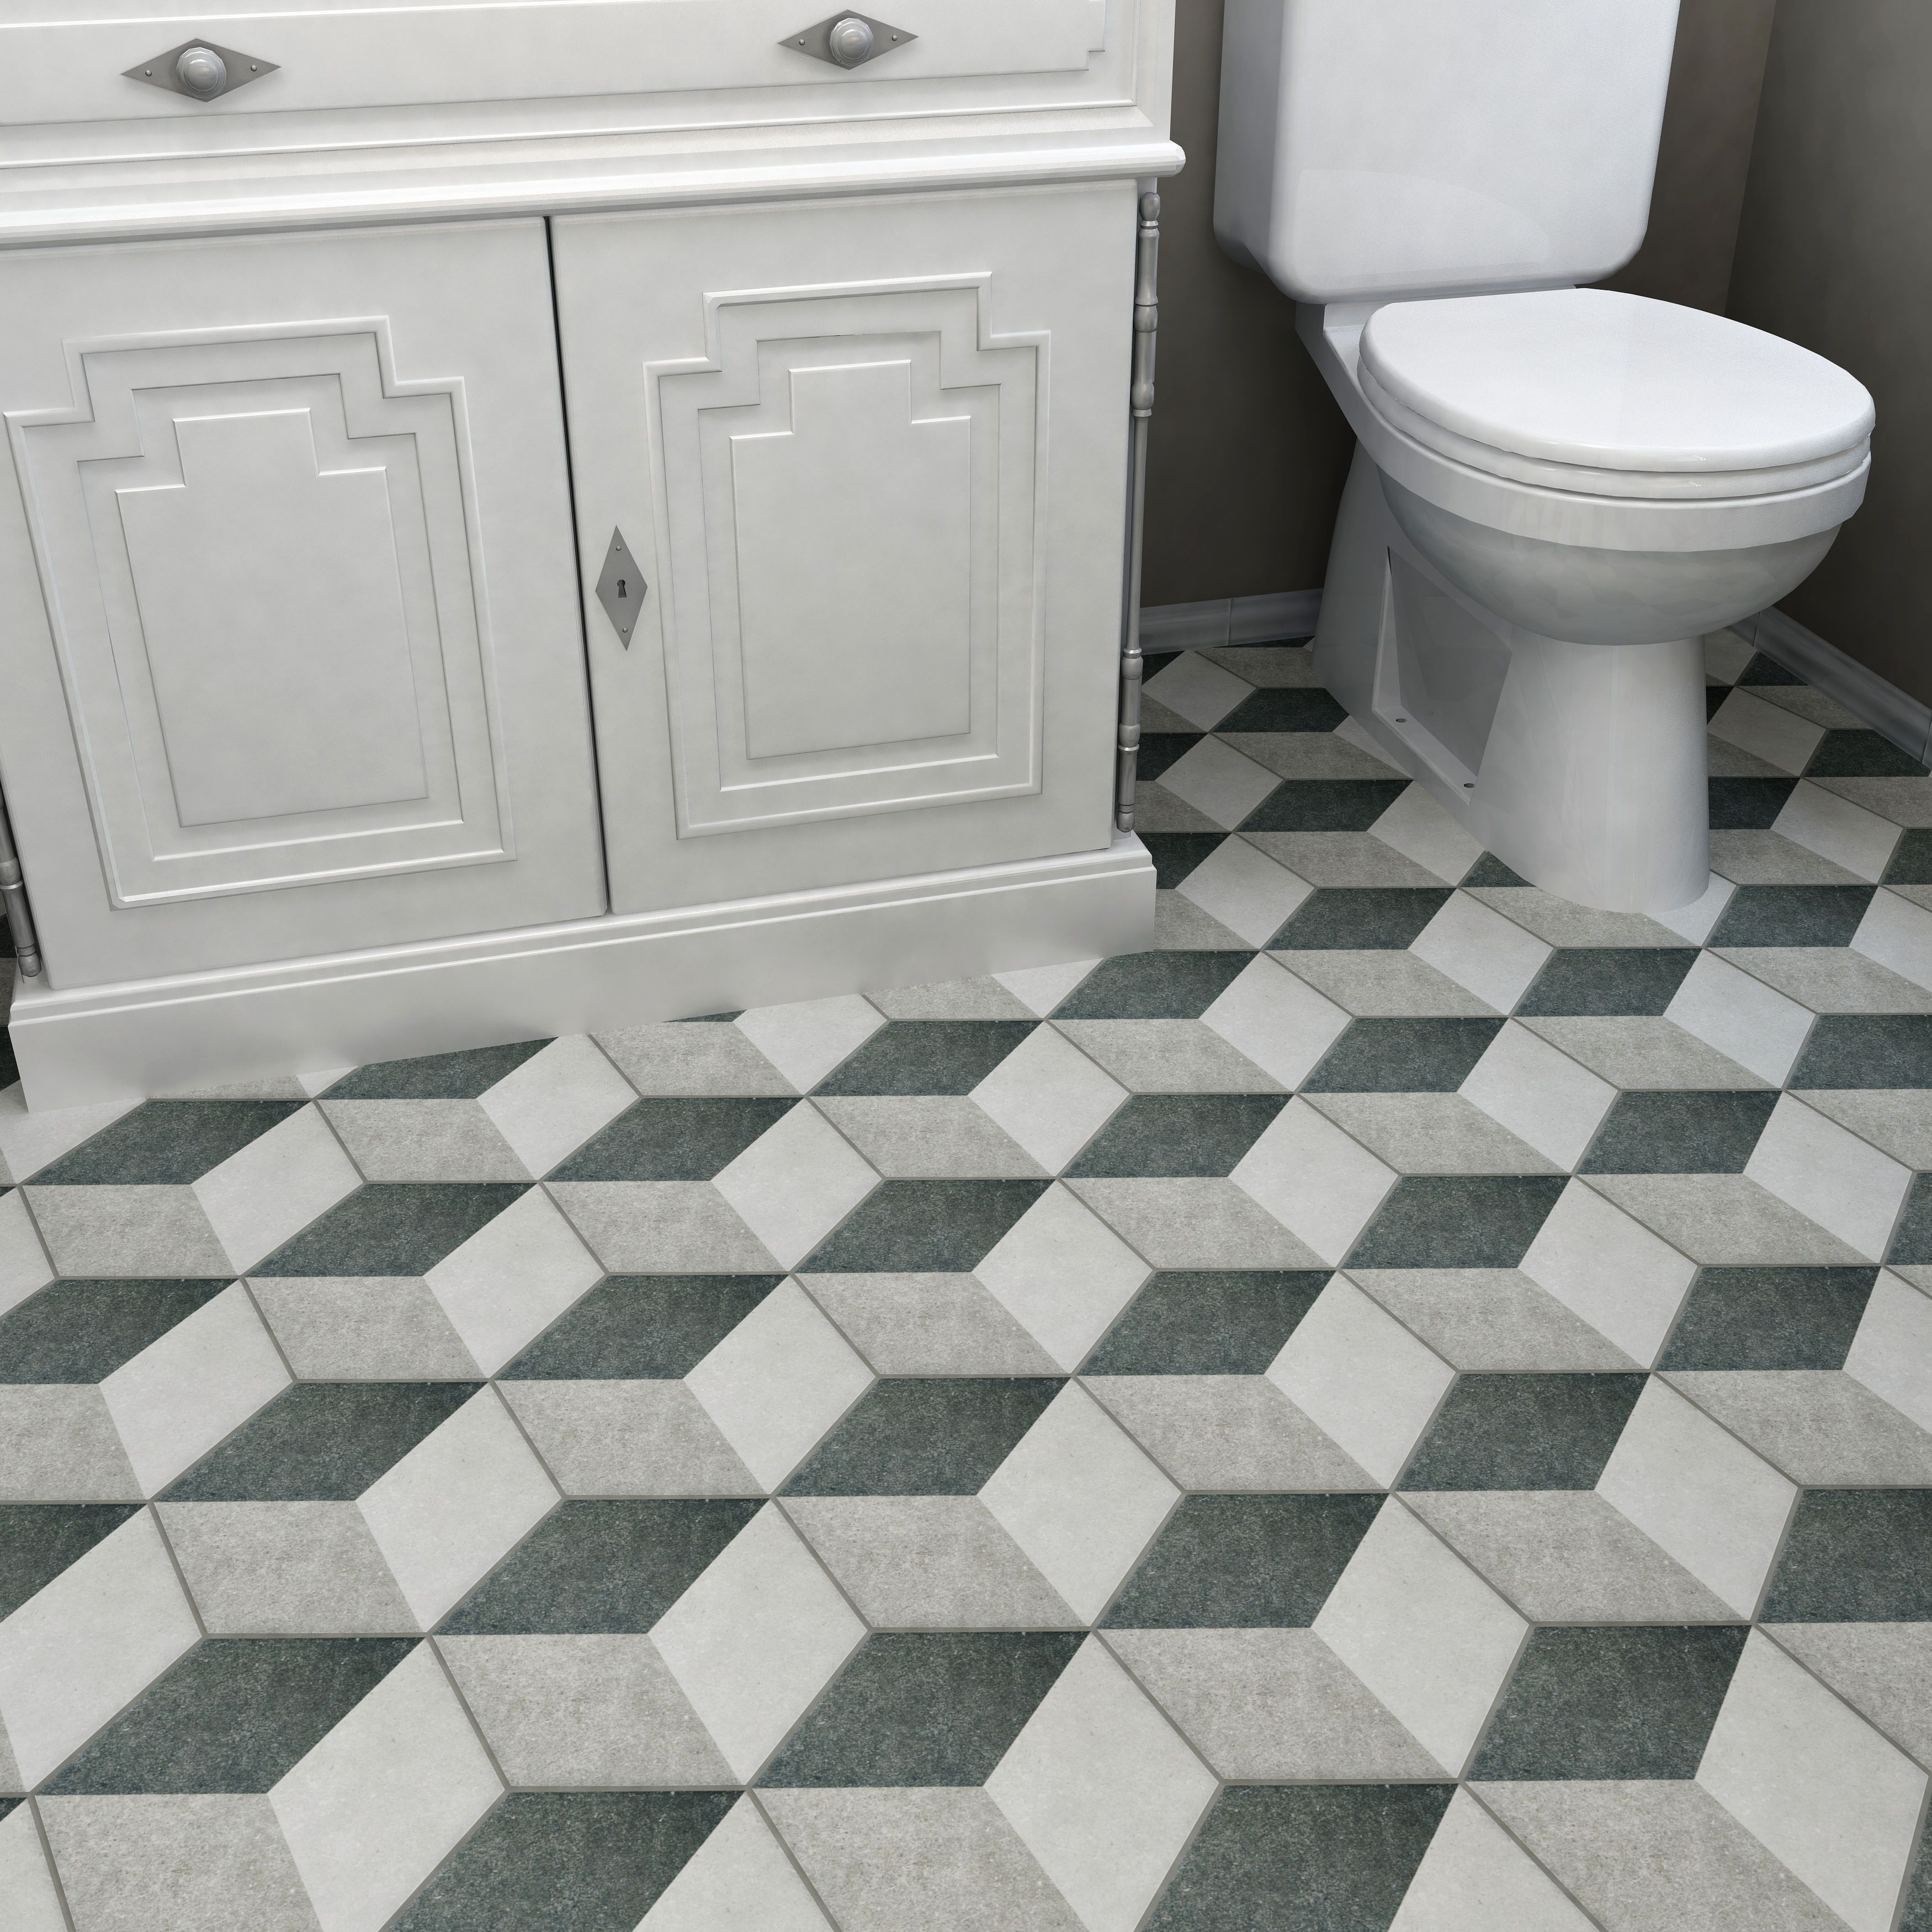 Transit 9 X 10 Porcelain Wall Floor Tile Porcelain Flooring Flooring Natural Stone Tile Bathroom